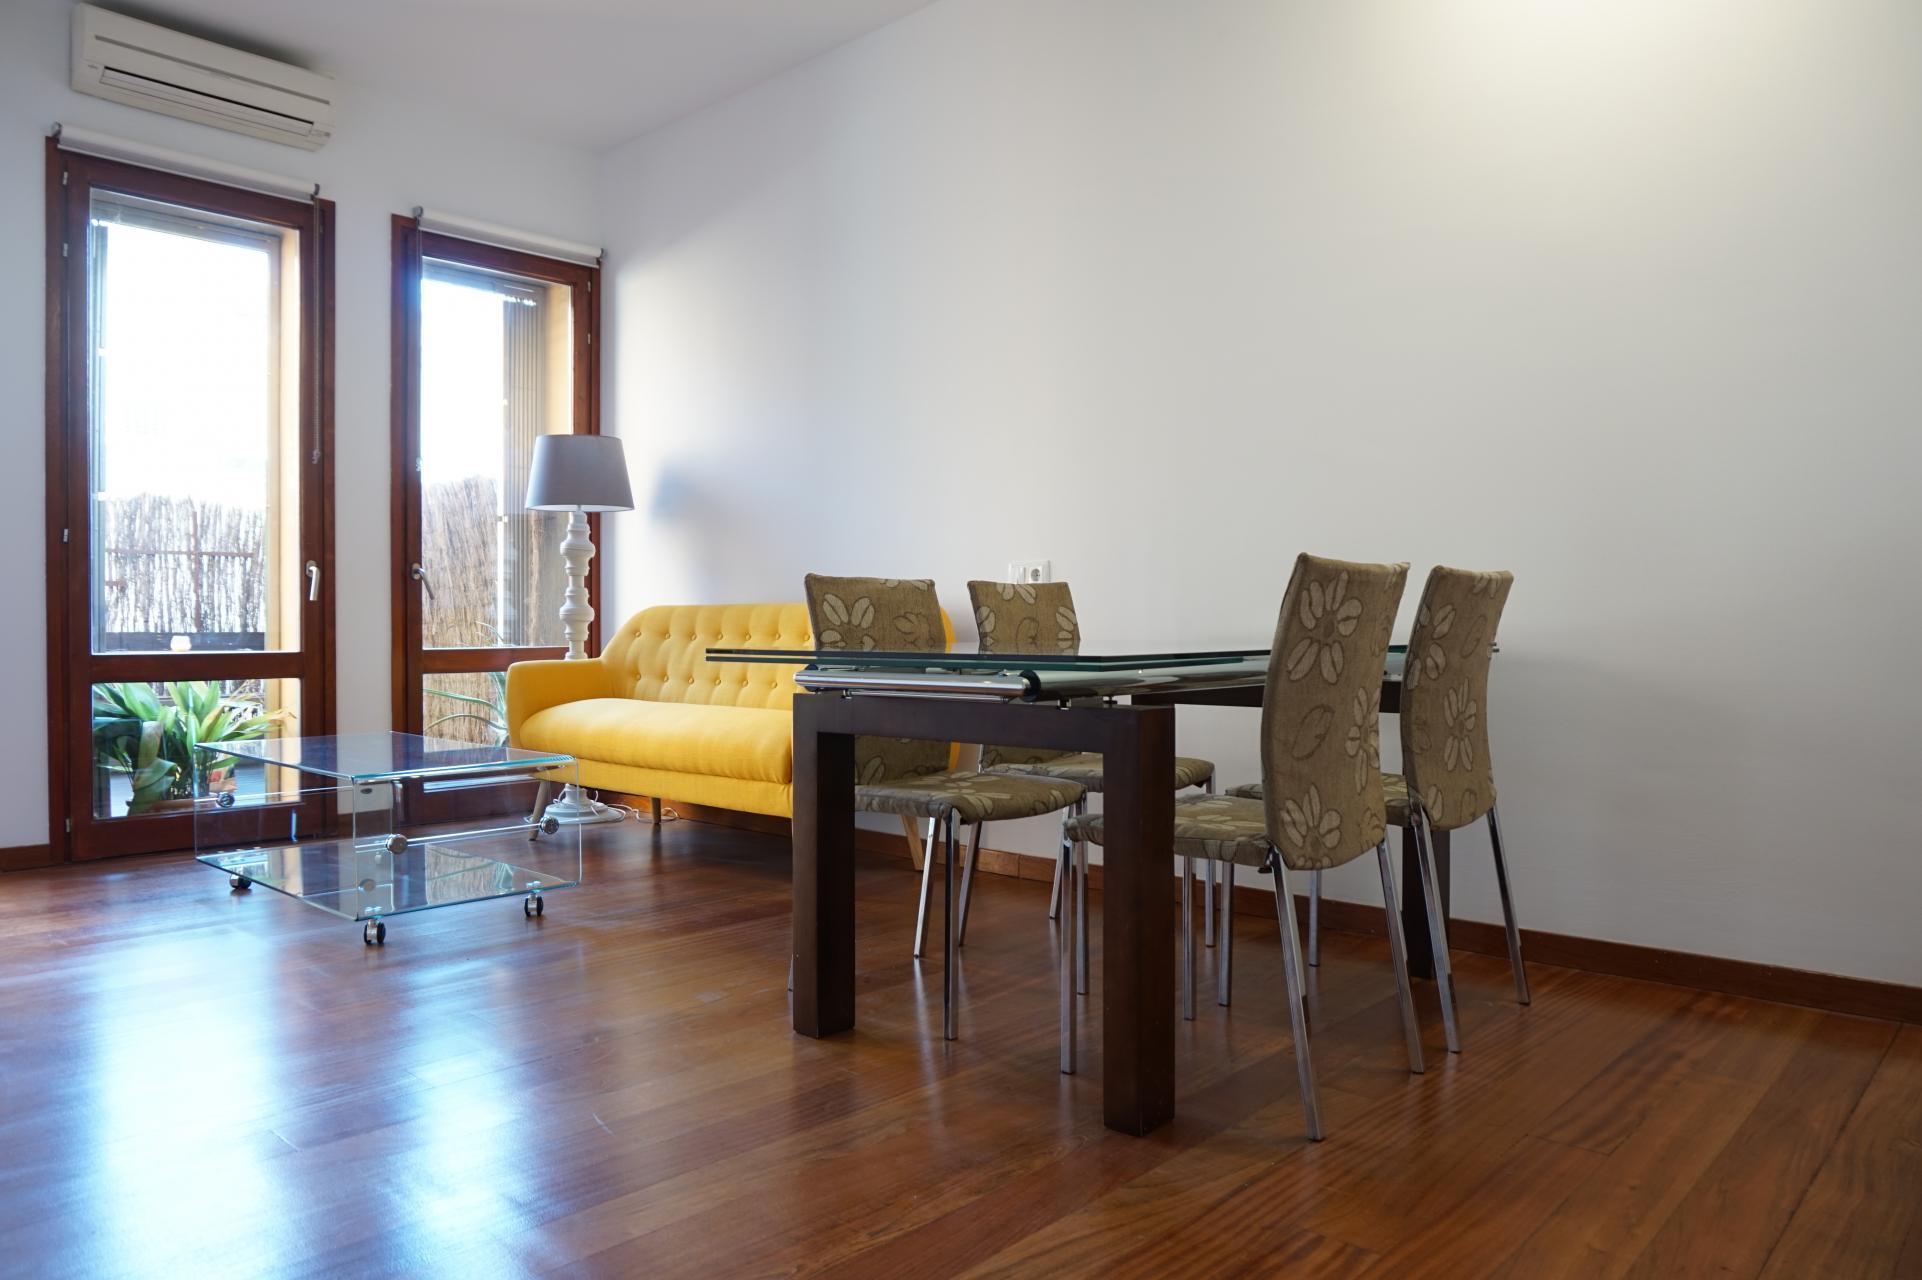 Apartment for Rent in Barcelona Plaça Bacardí - Amàlia